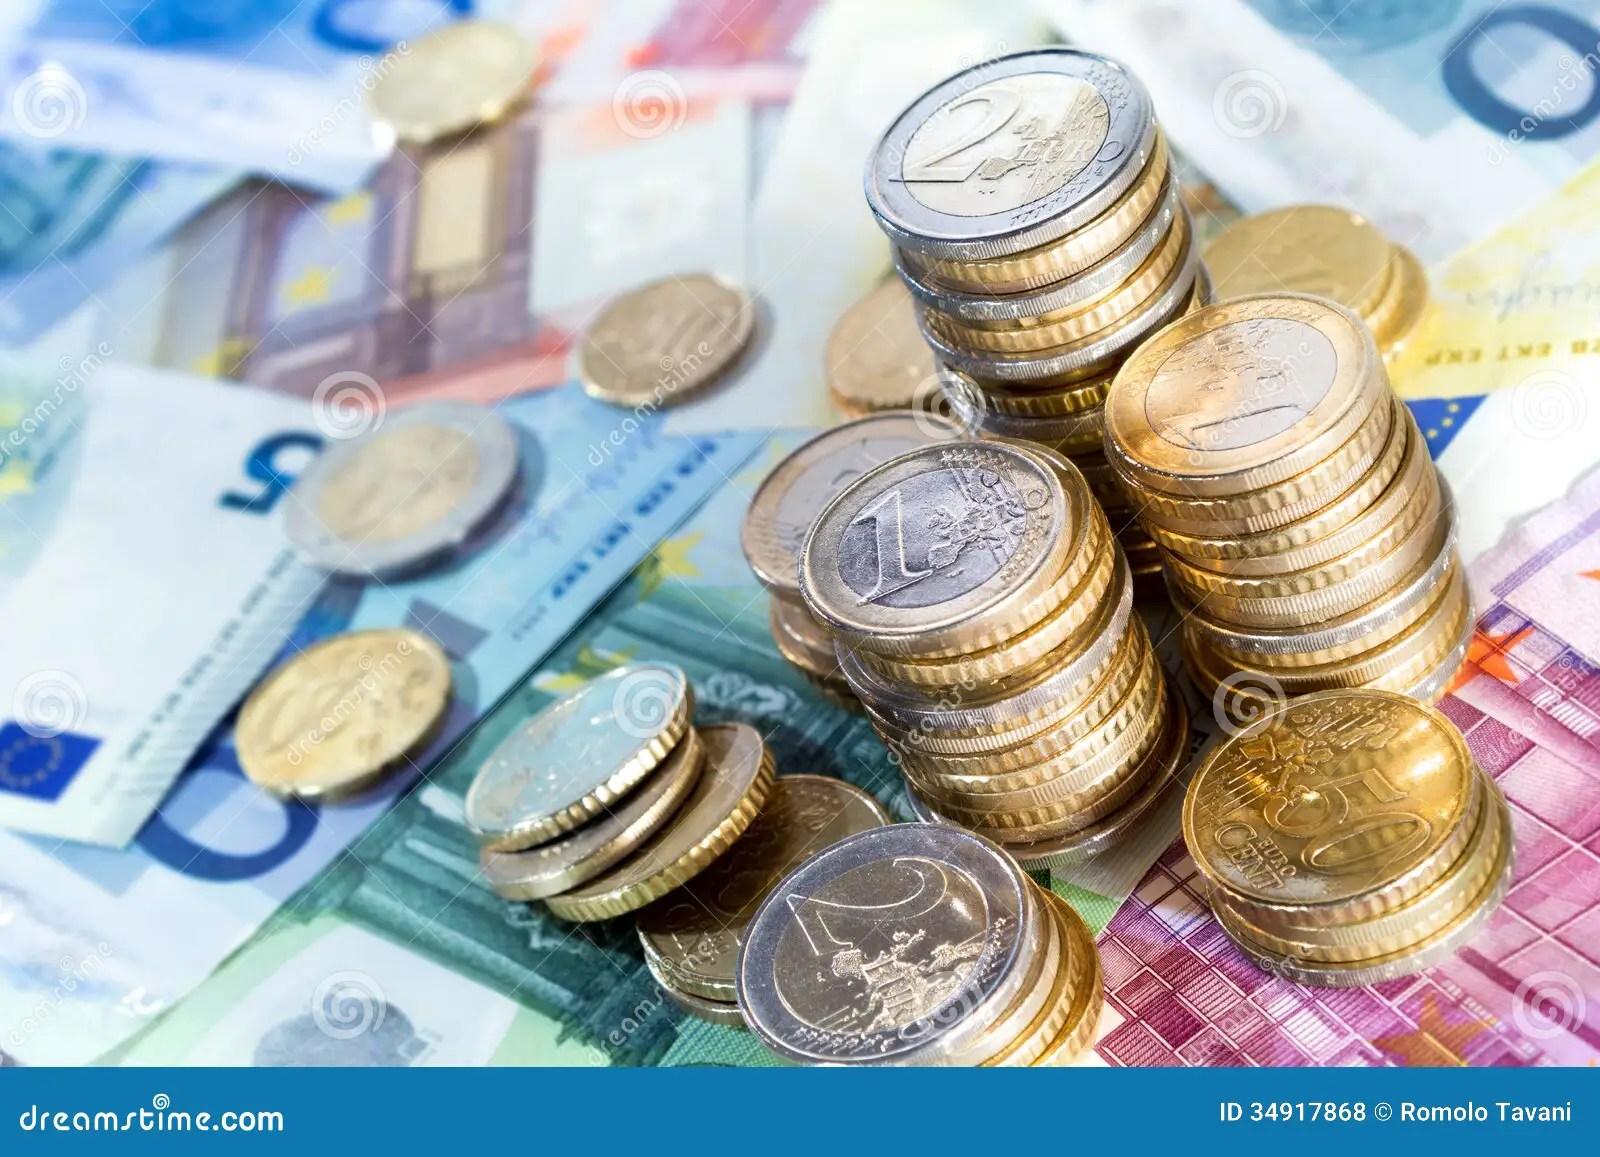 Euro Money Stacks And Bills Royalty Free Stock Photos